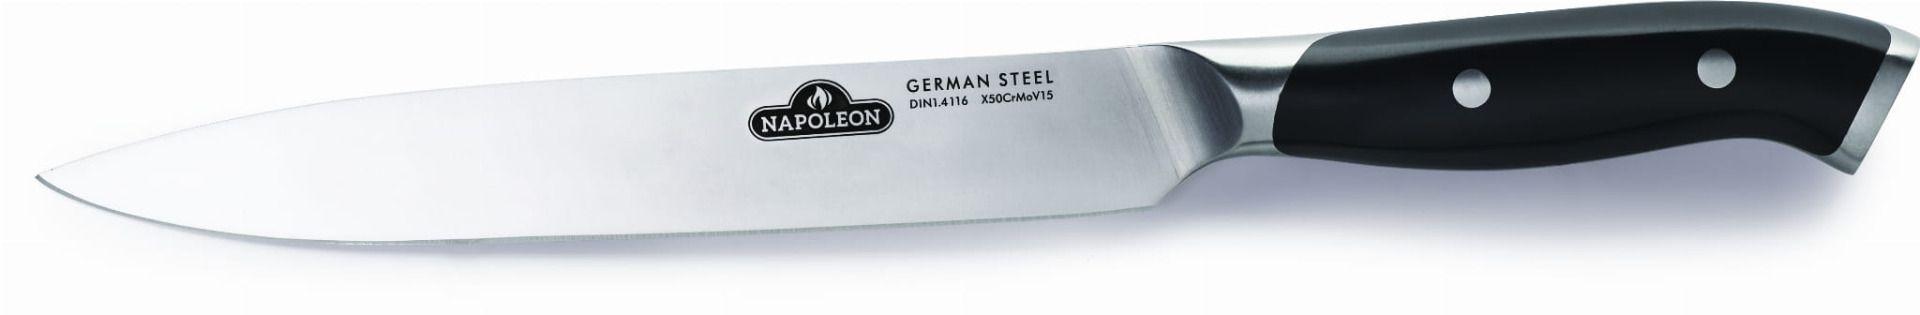 napoleon carver nóż polgrill dealer